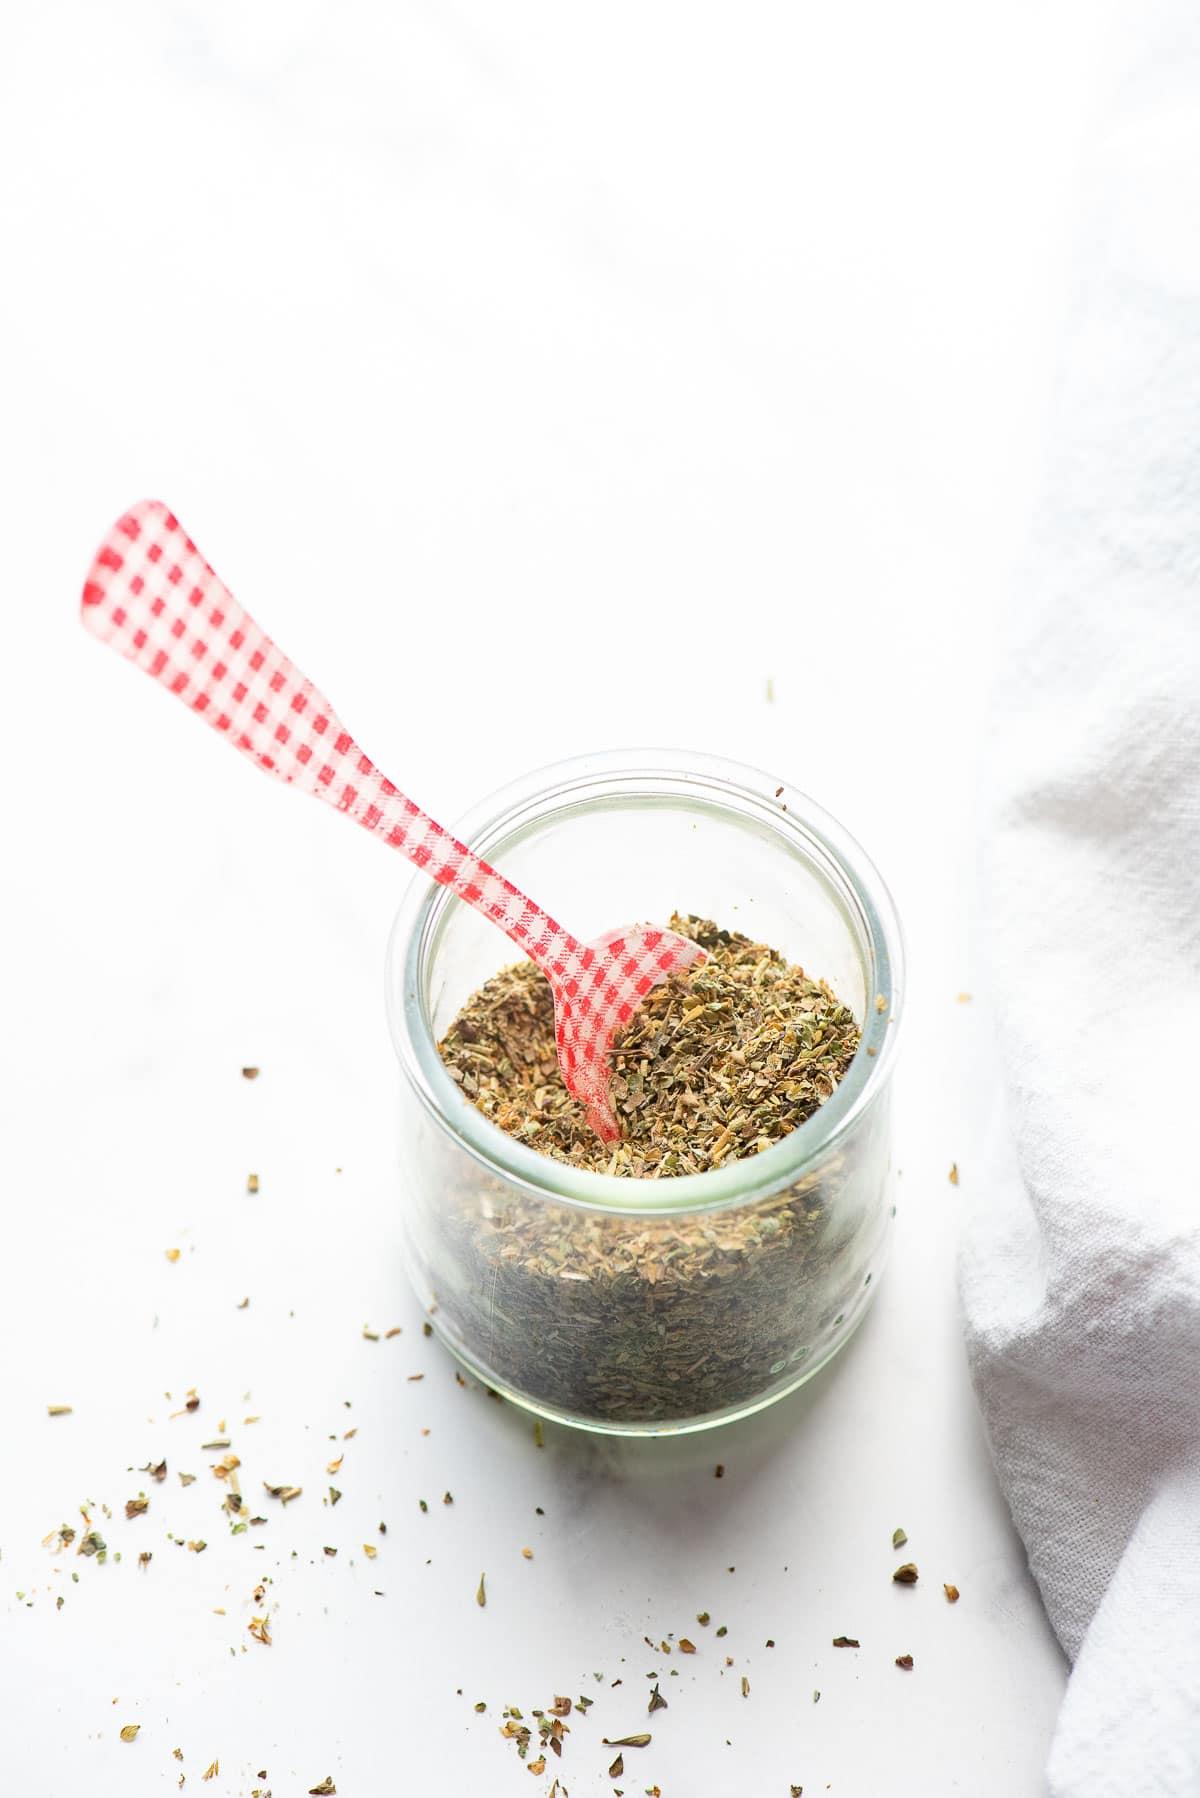 Italian seasoning in jar close up with spoon